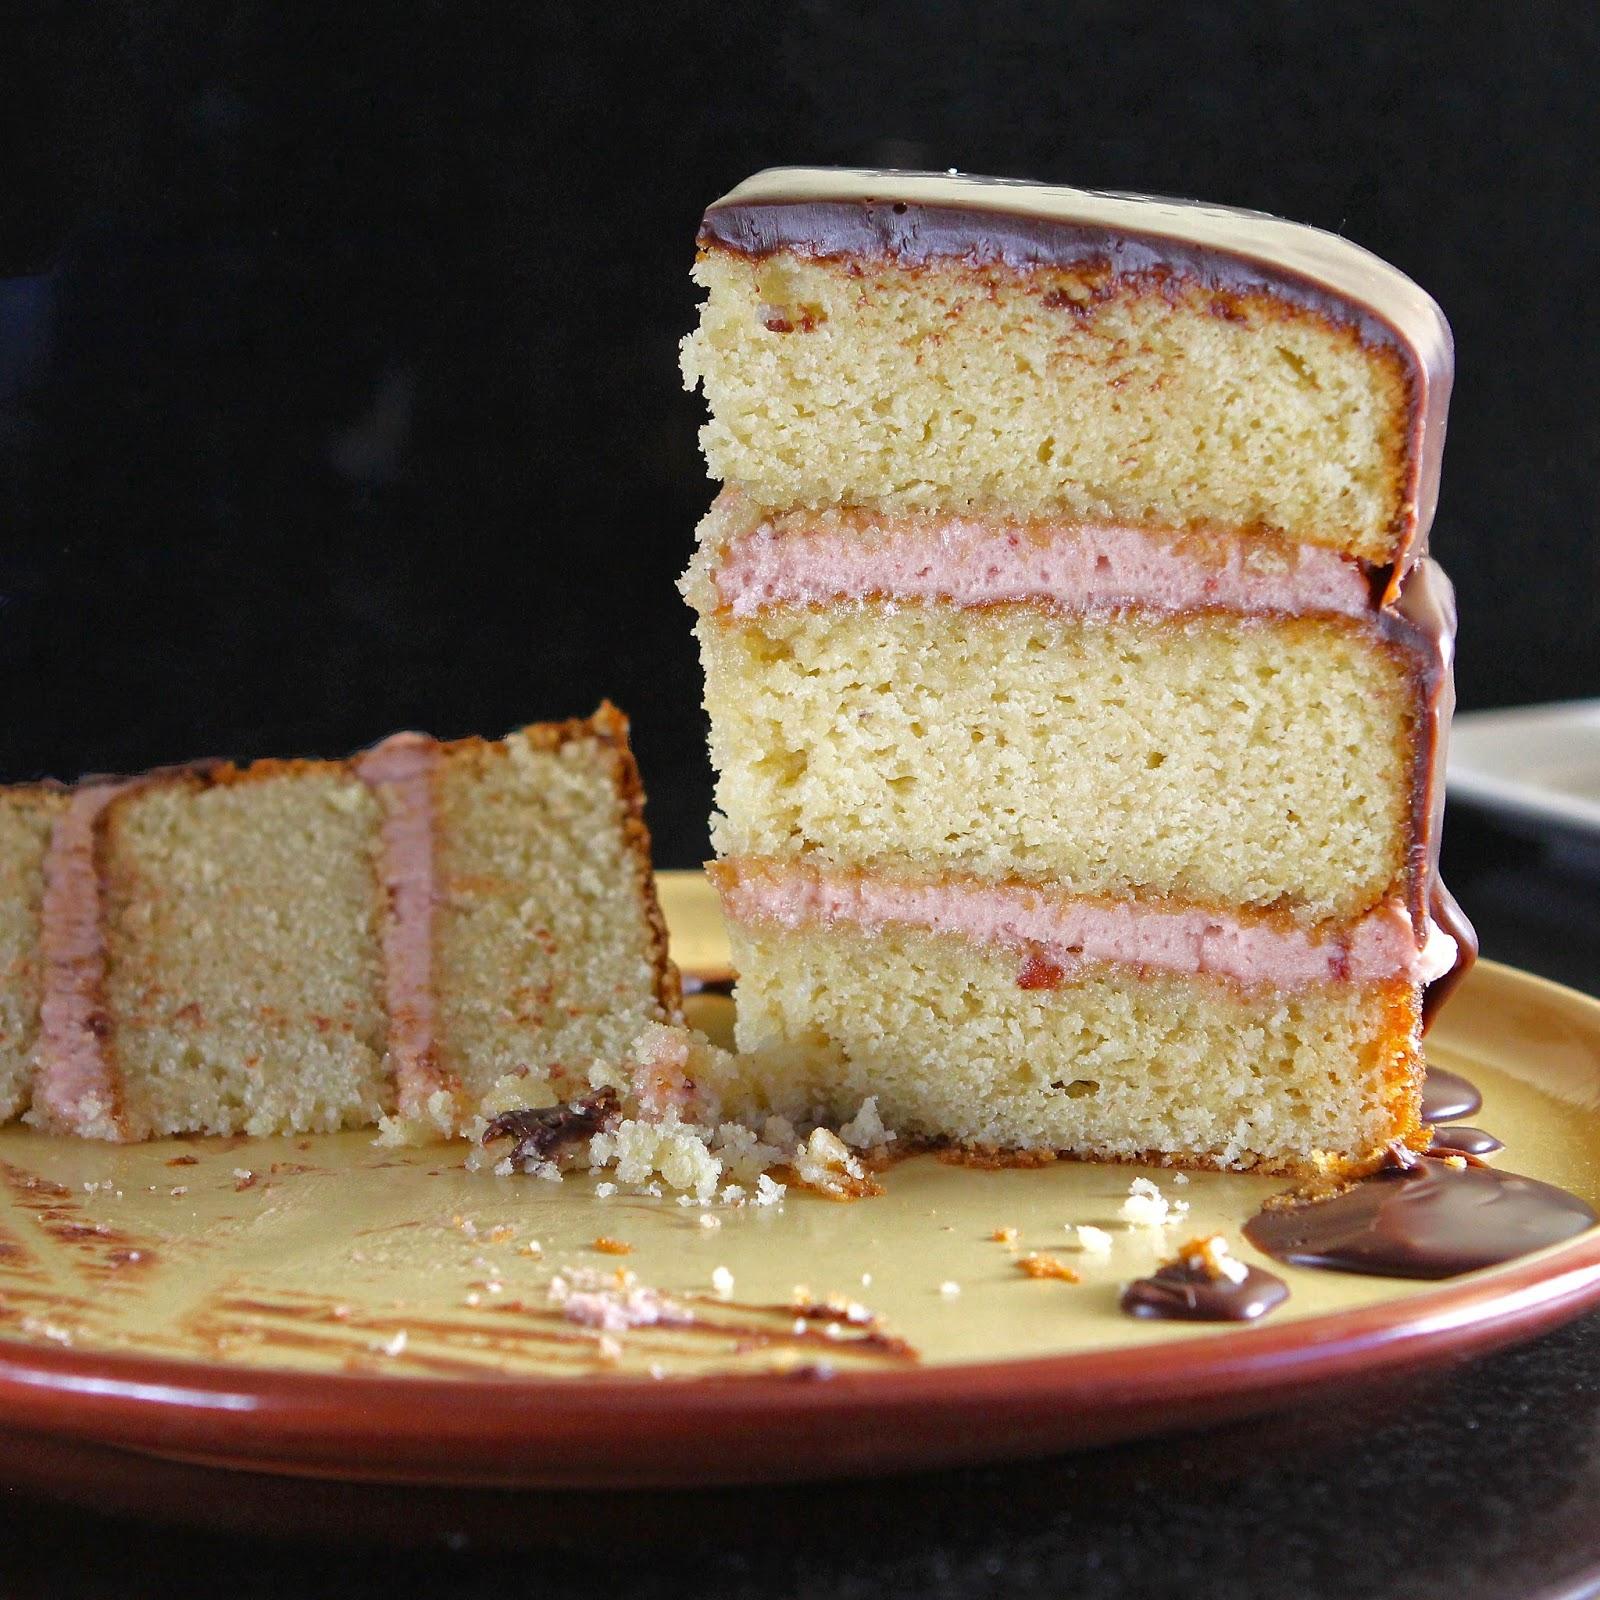 Vanilla Sponge Cake Made With Oil